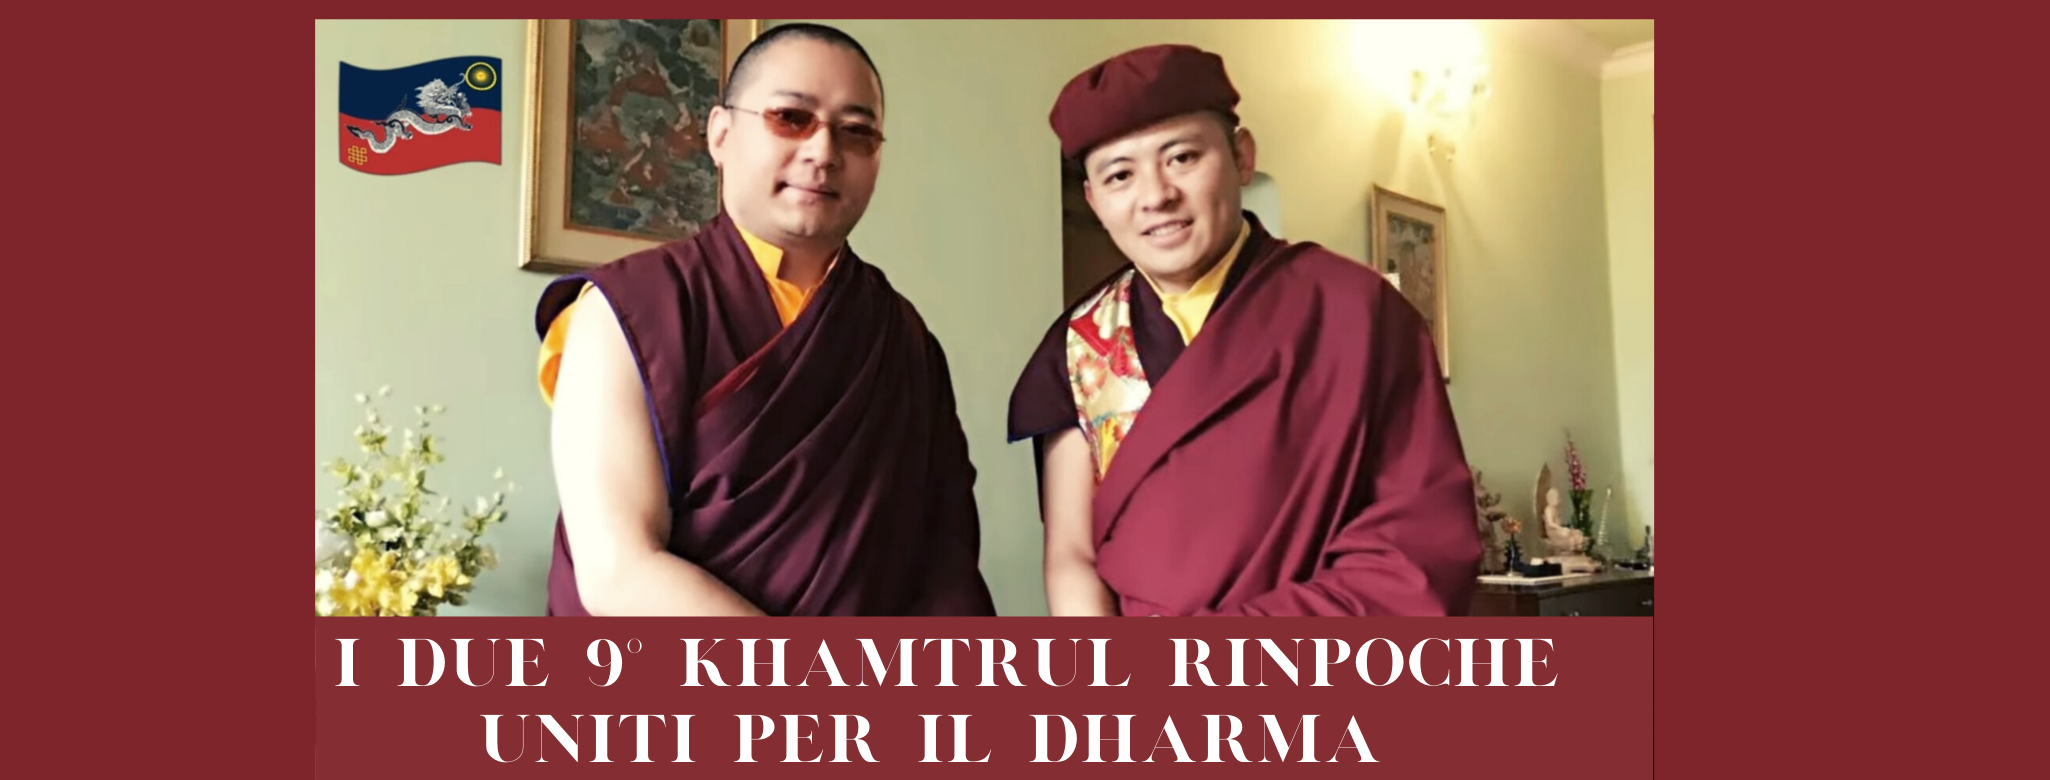 S.S. I 9° Khamtrul Rinpoche